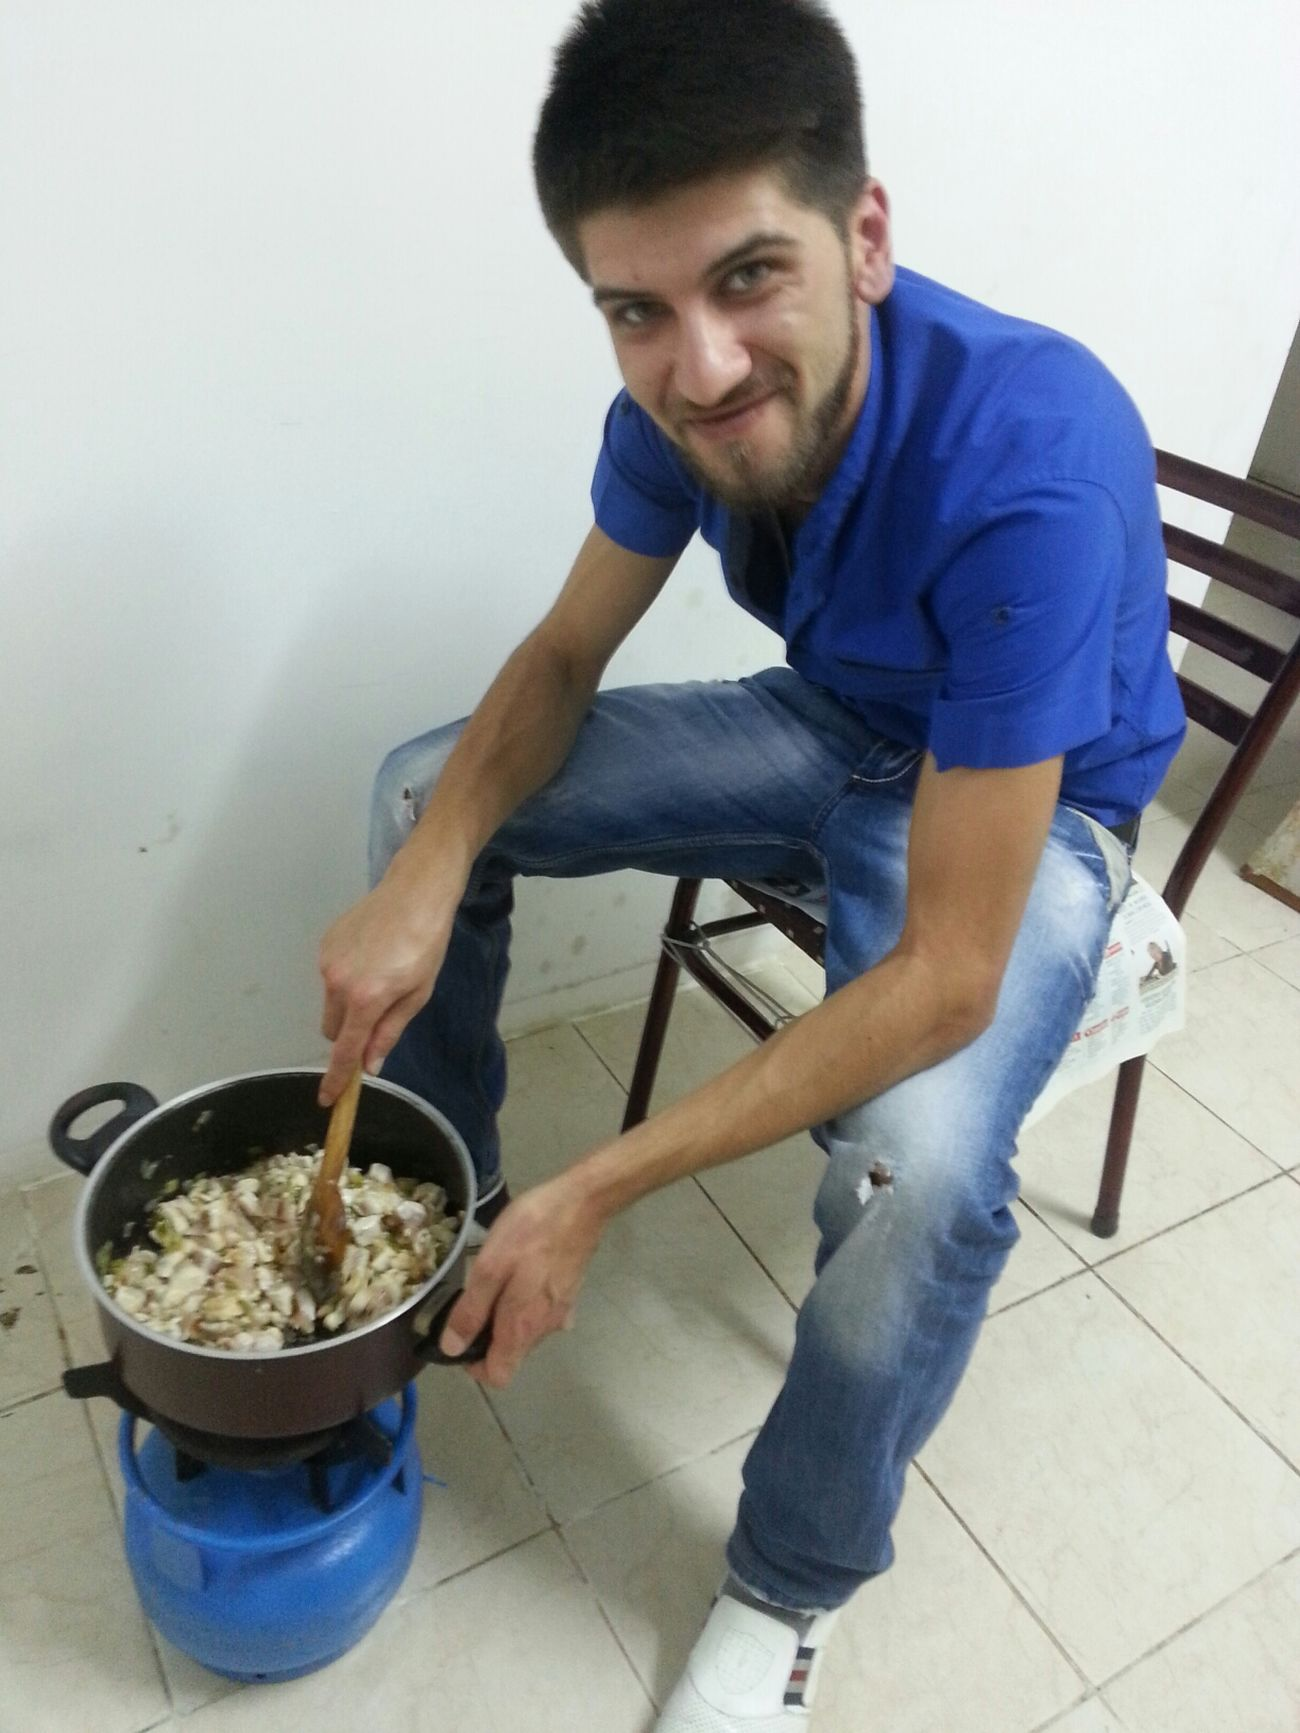 askm bnm bna yemekte hazırlarmış:)